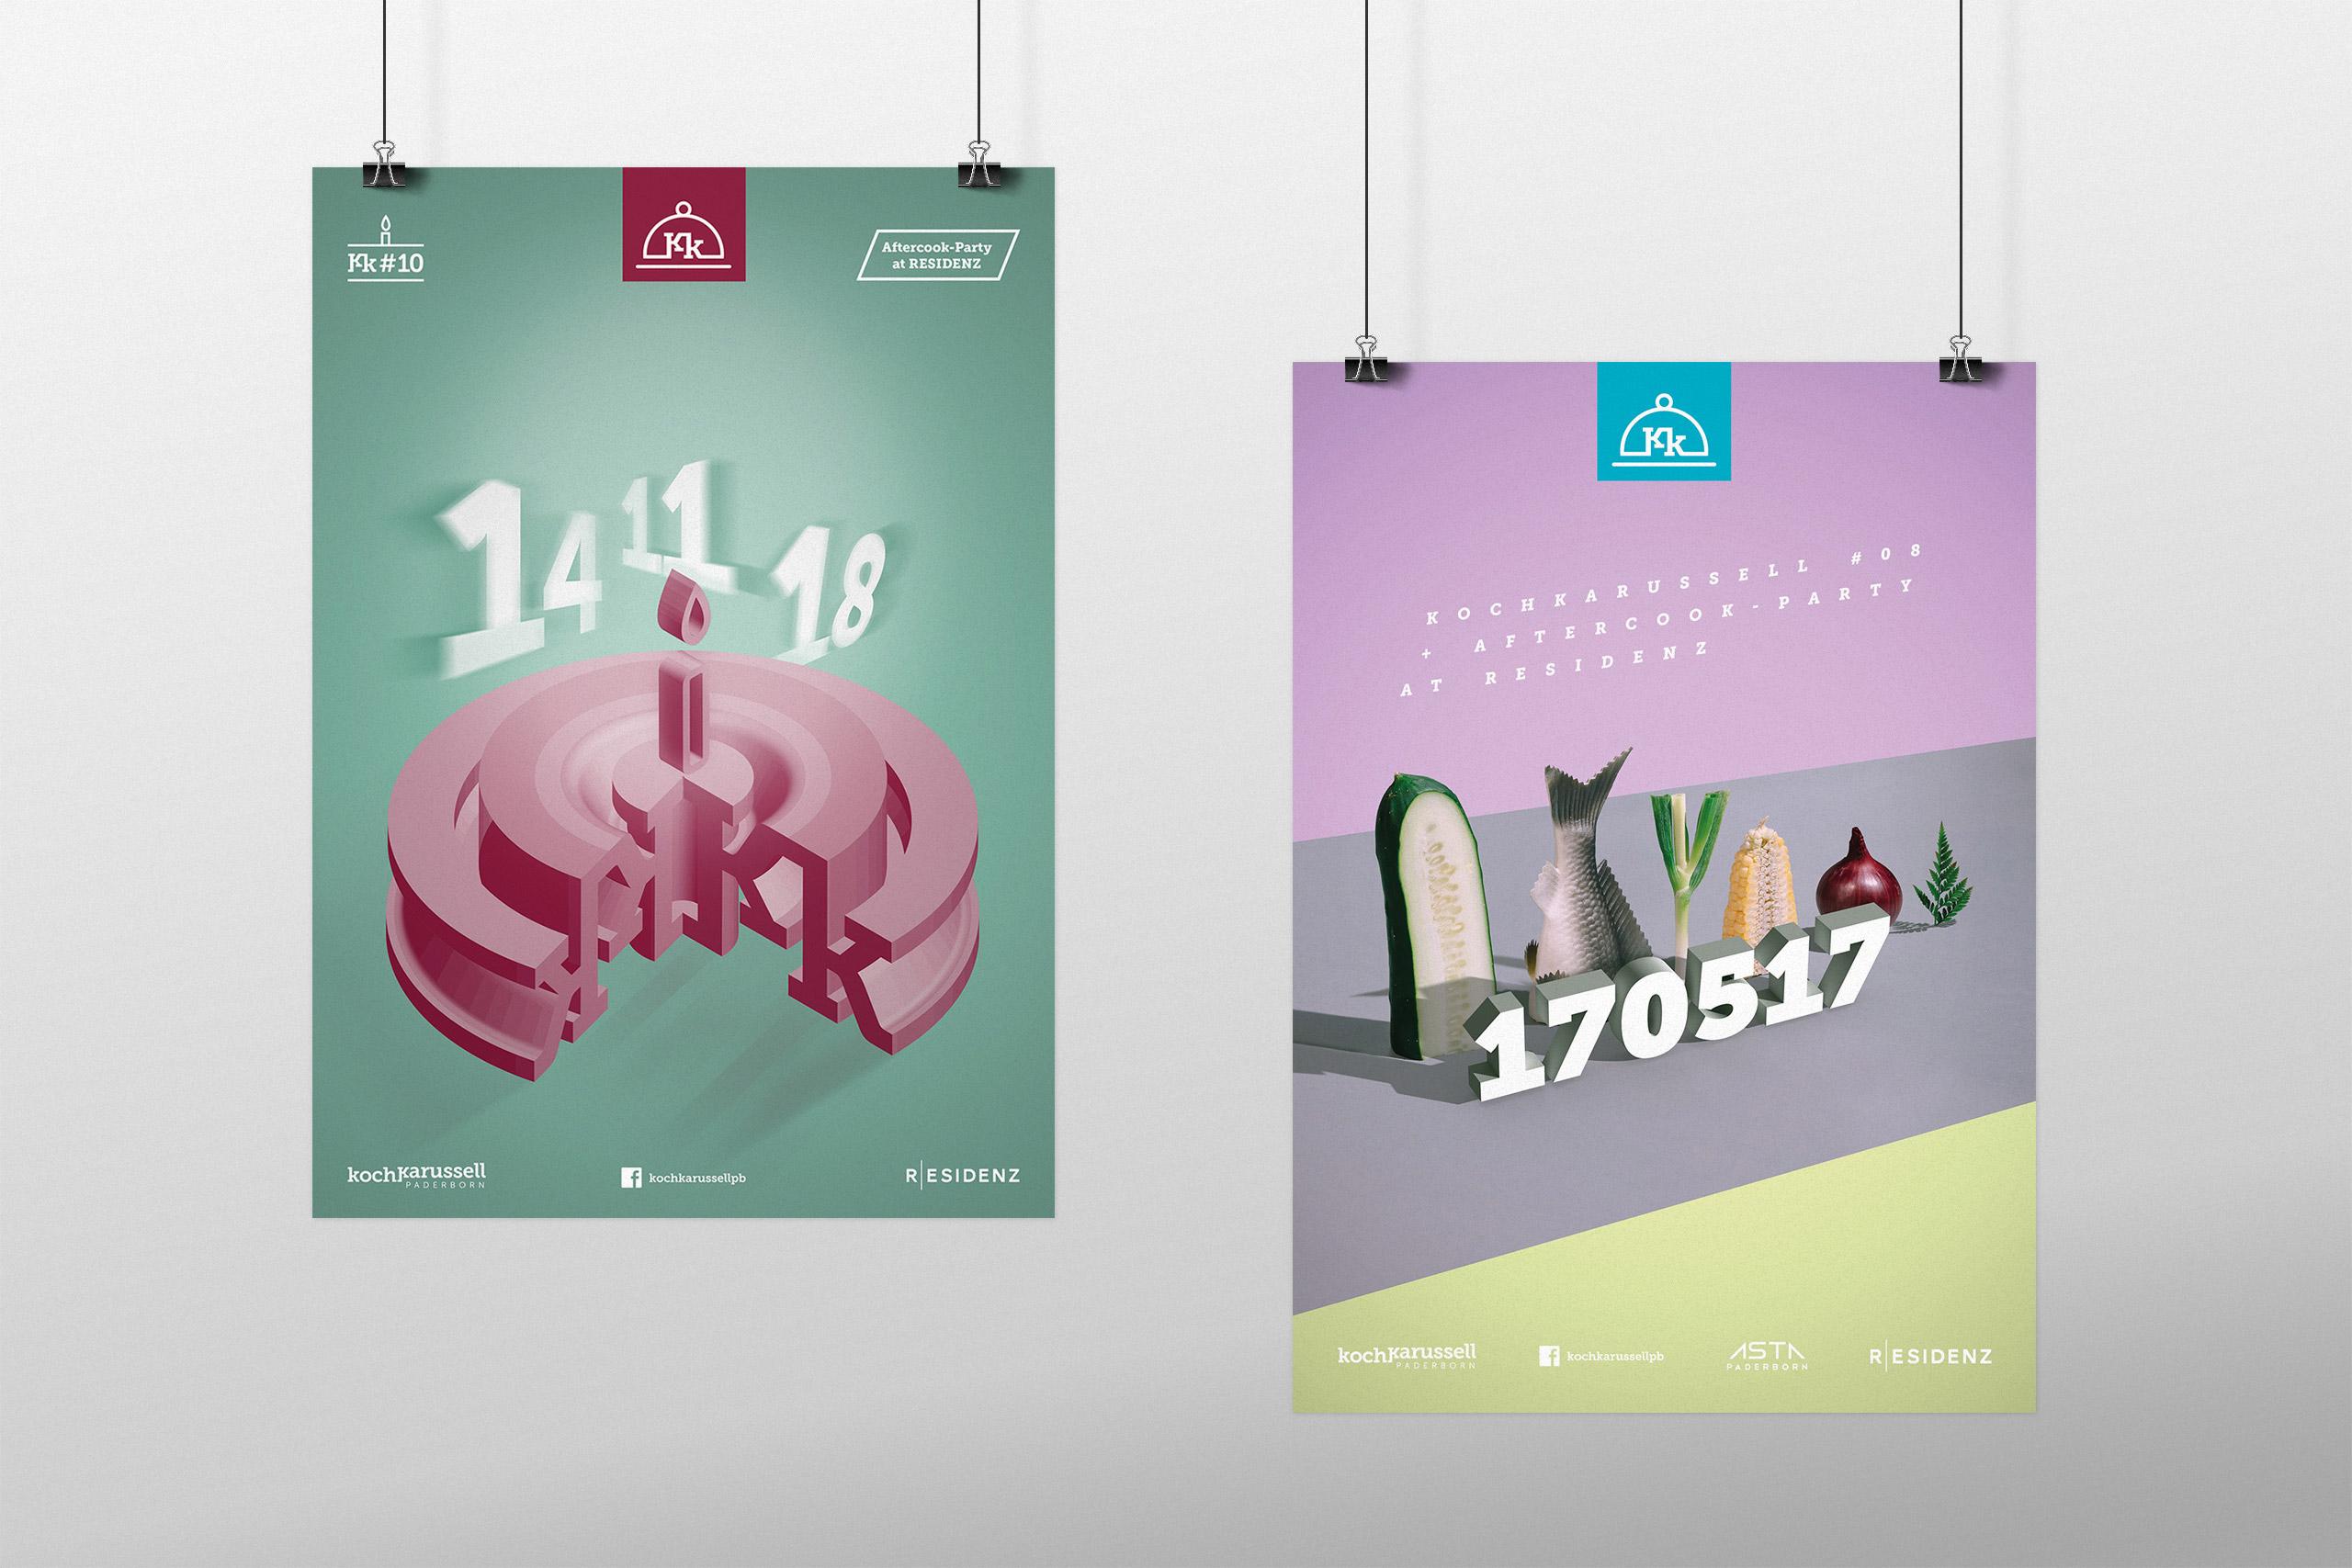 poster_mockup_1